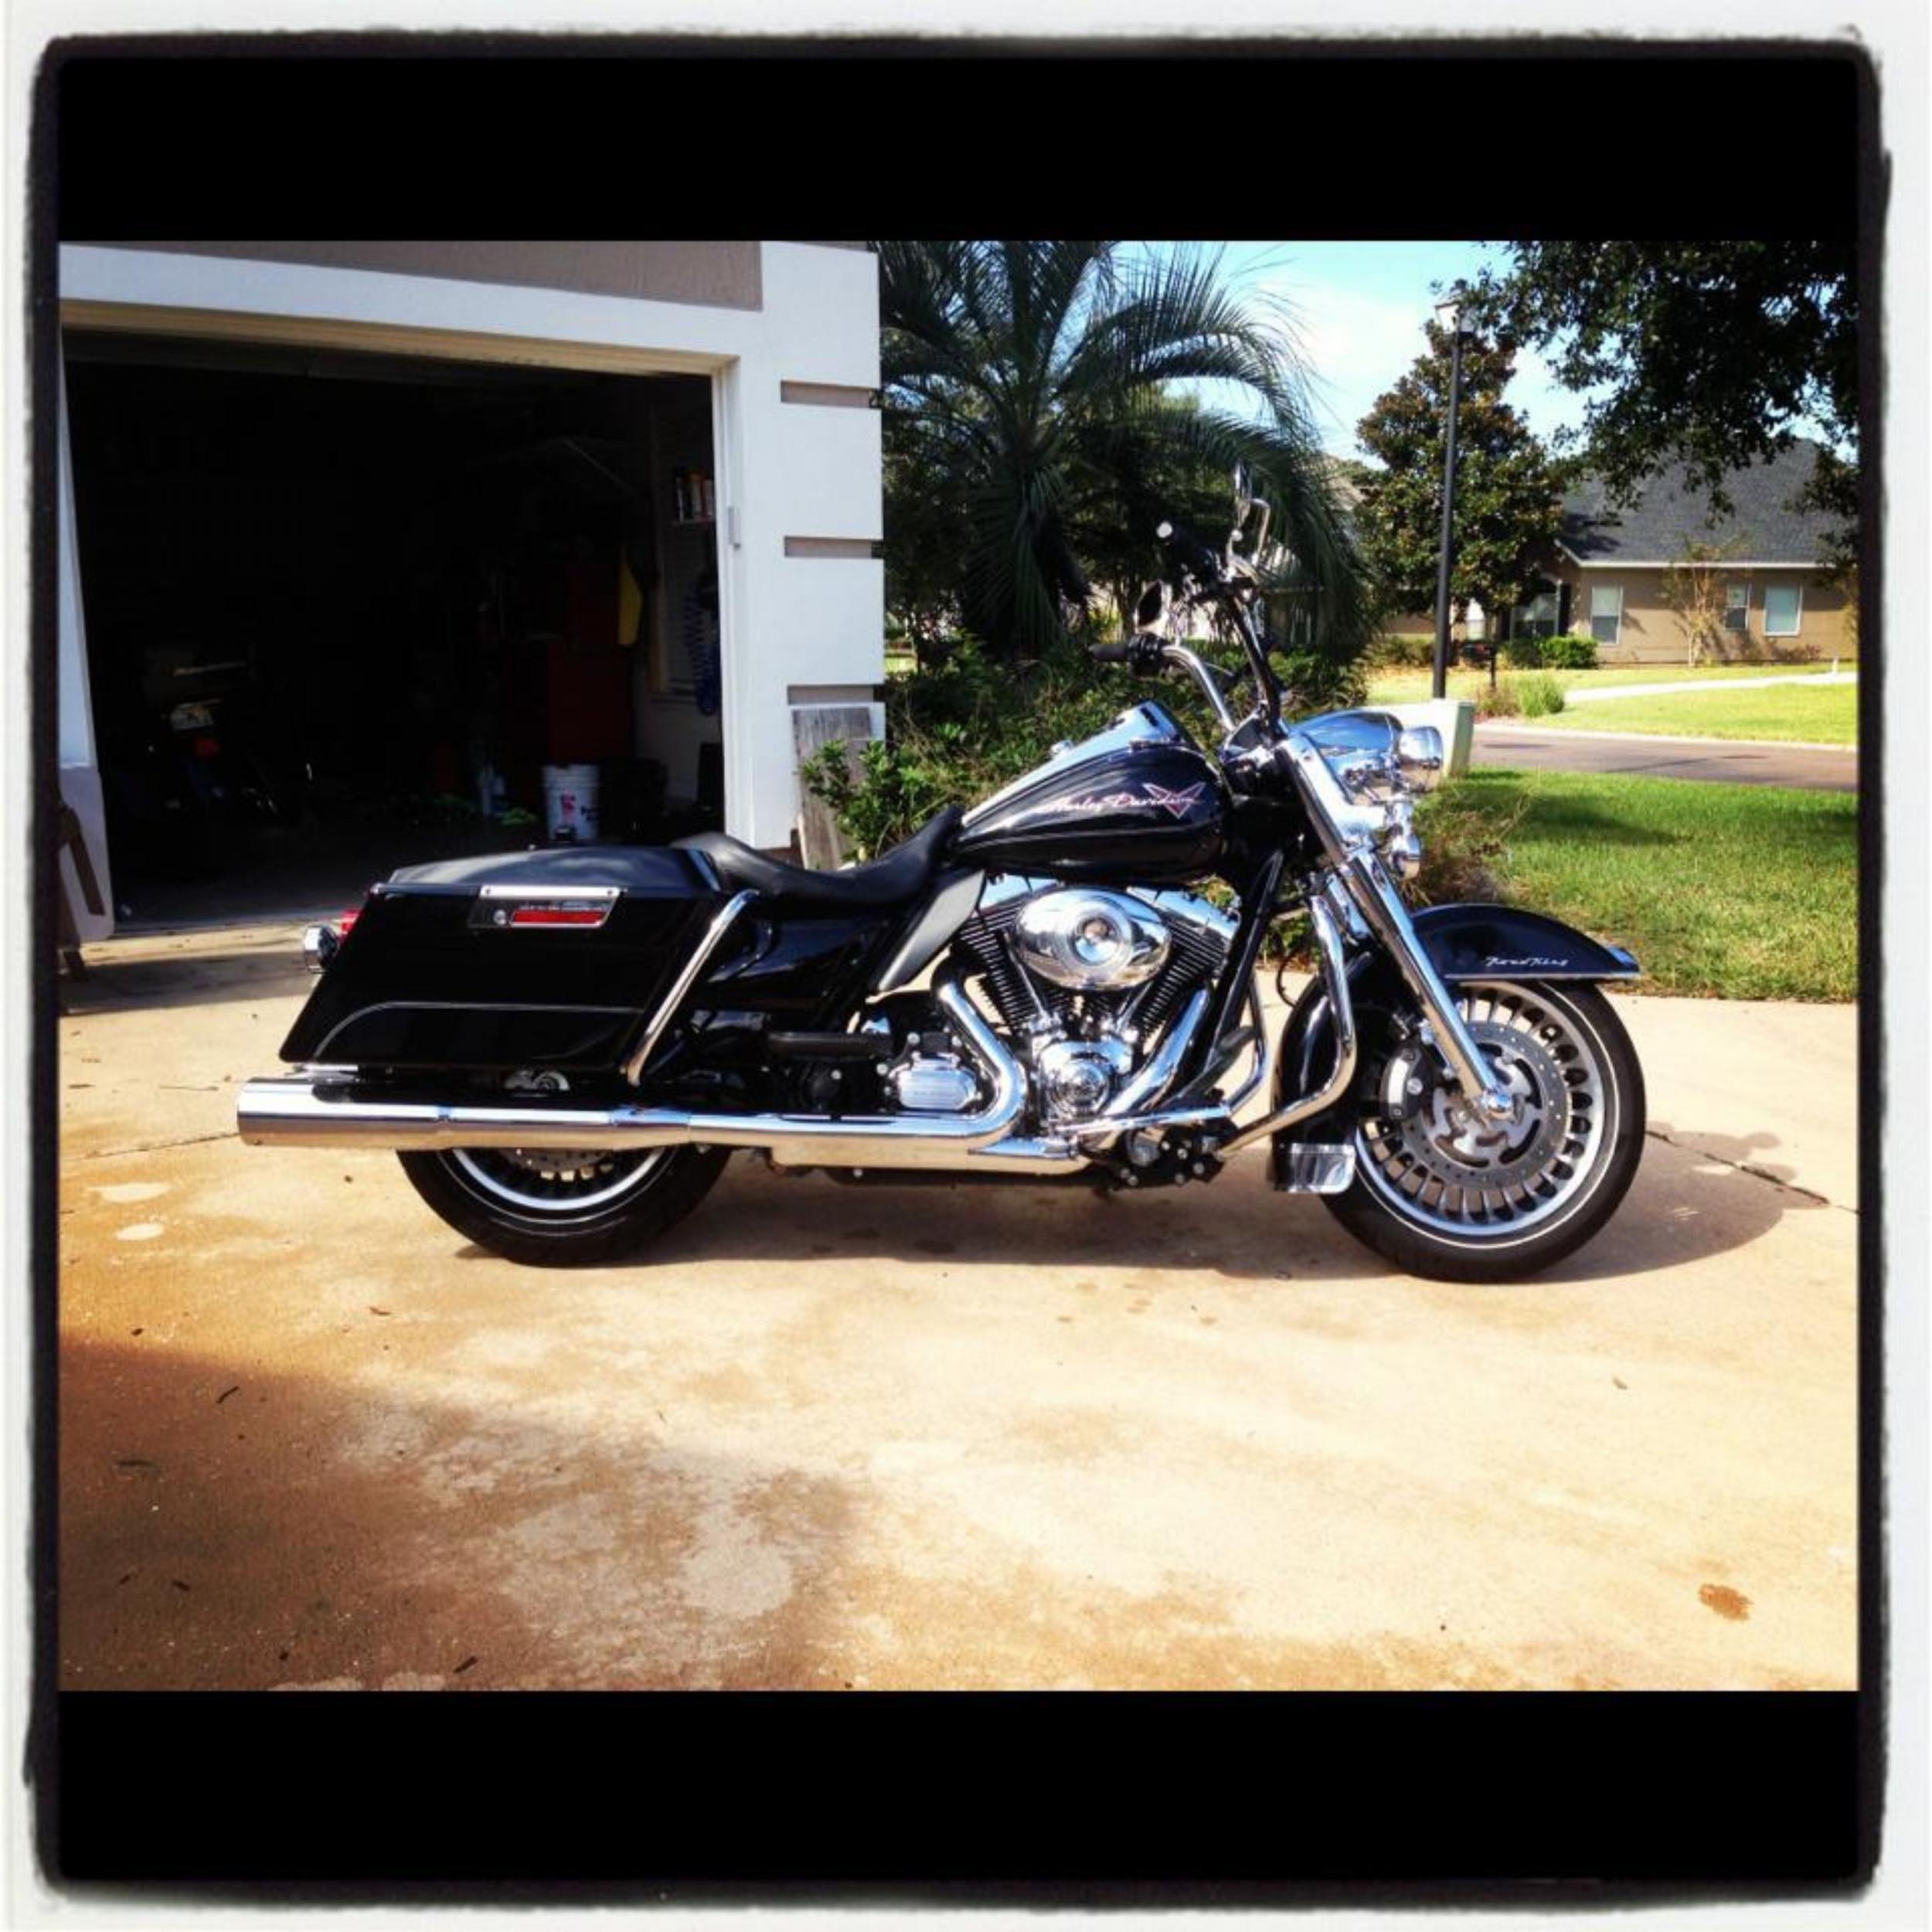 Click image for larger version  Name:bike.jpg Views:689 Size:470.8 KB ID:58992